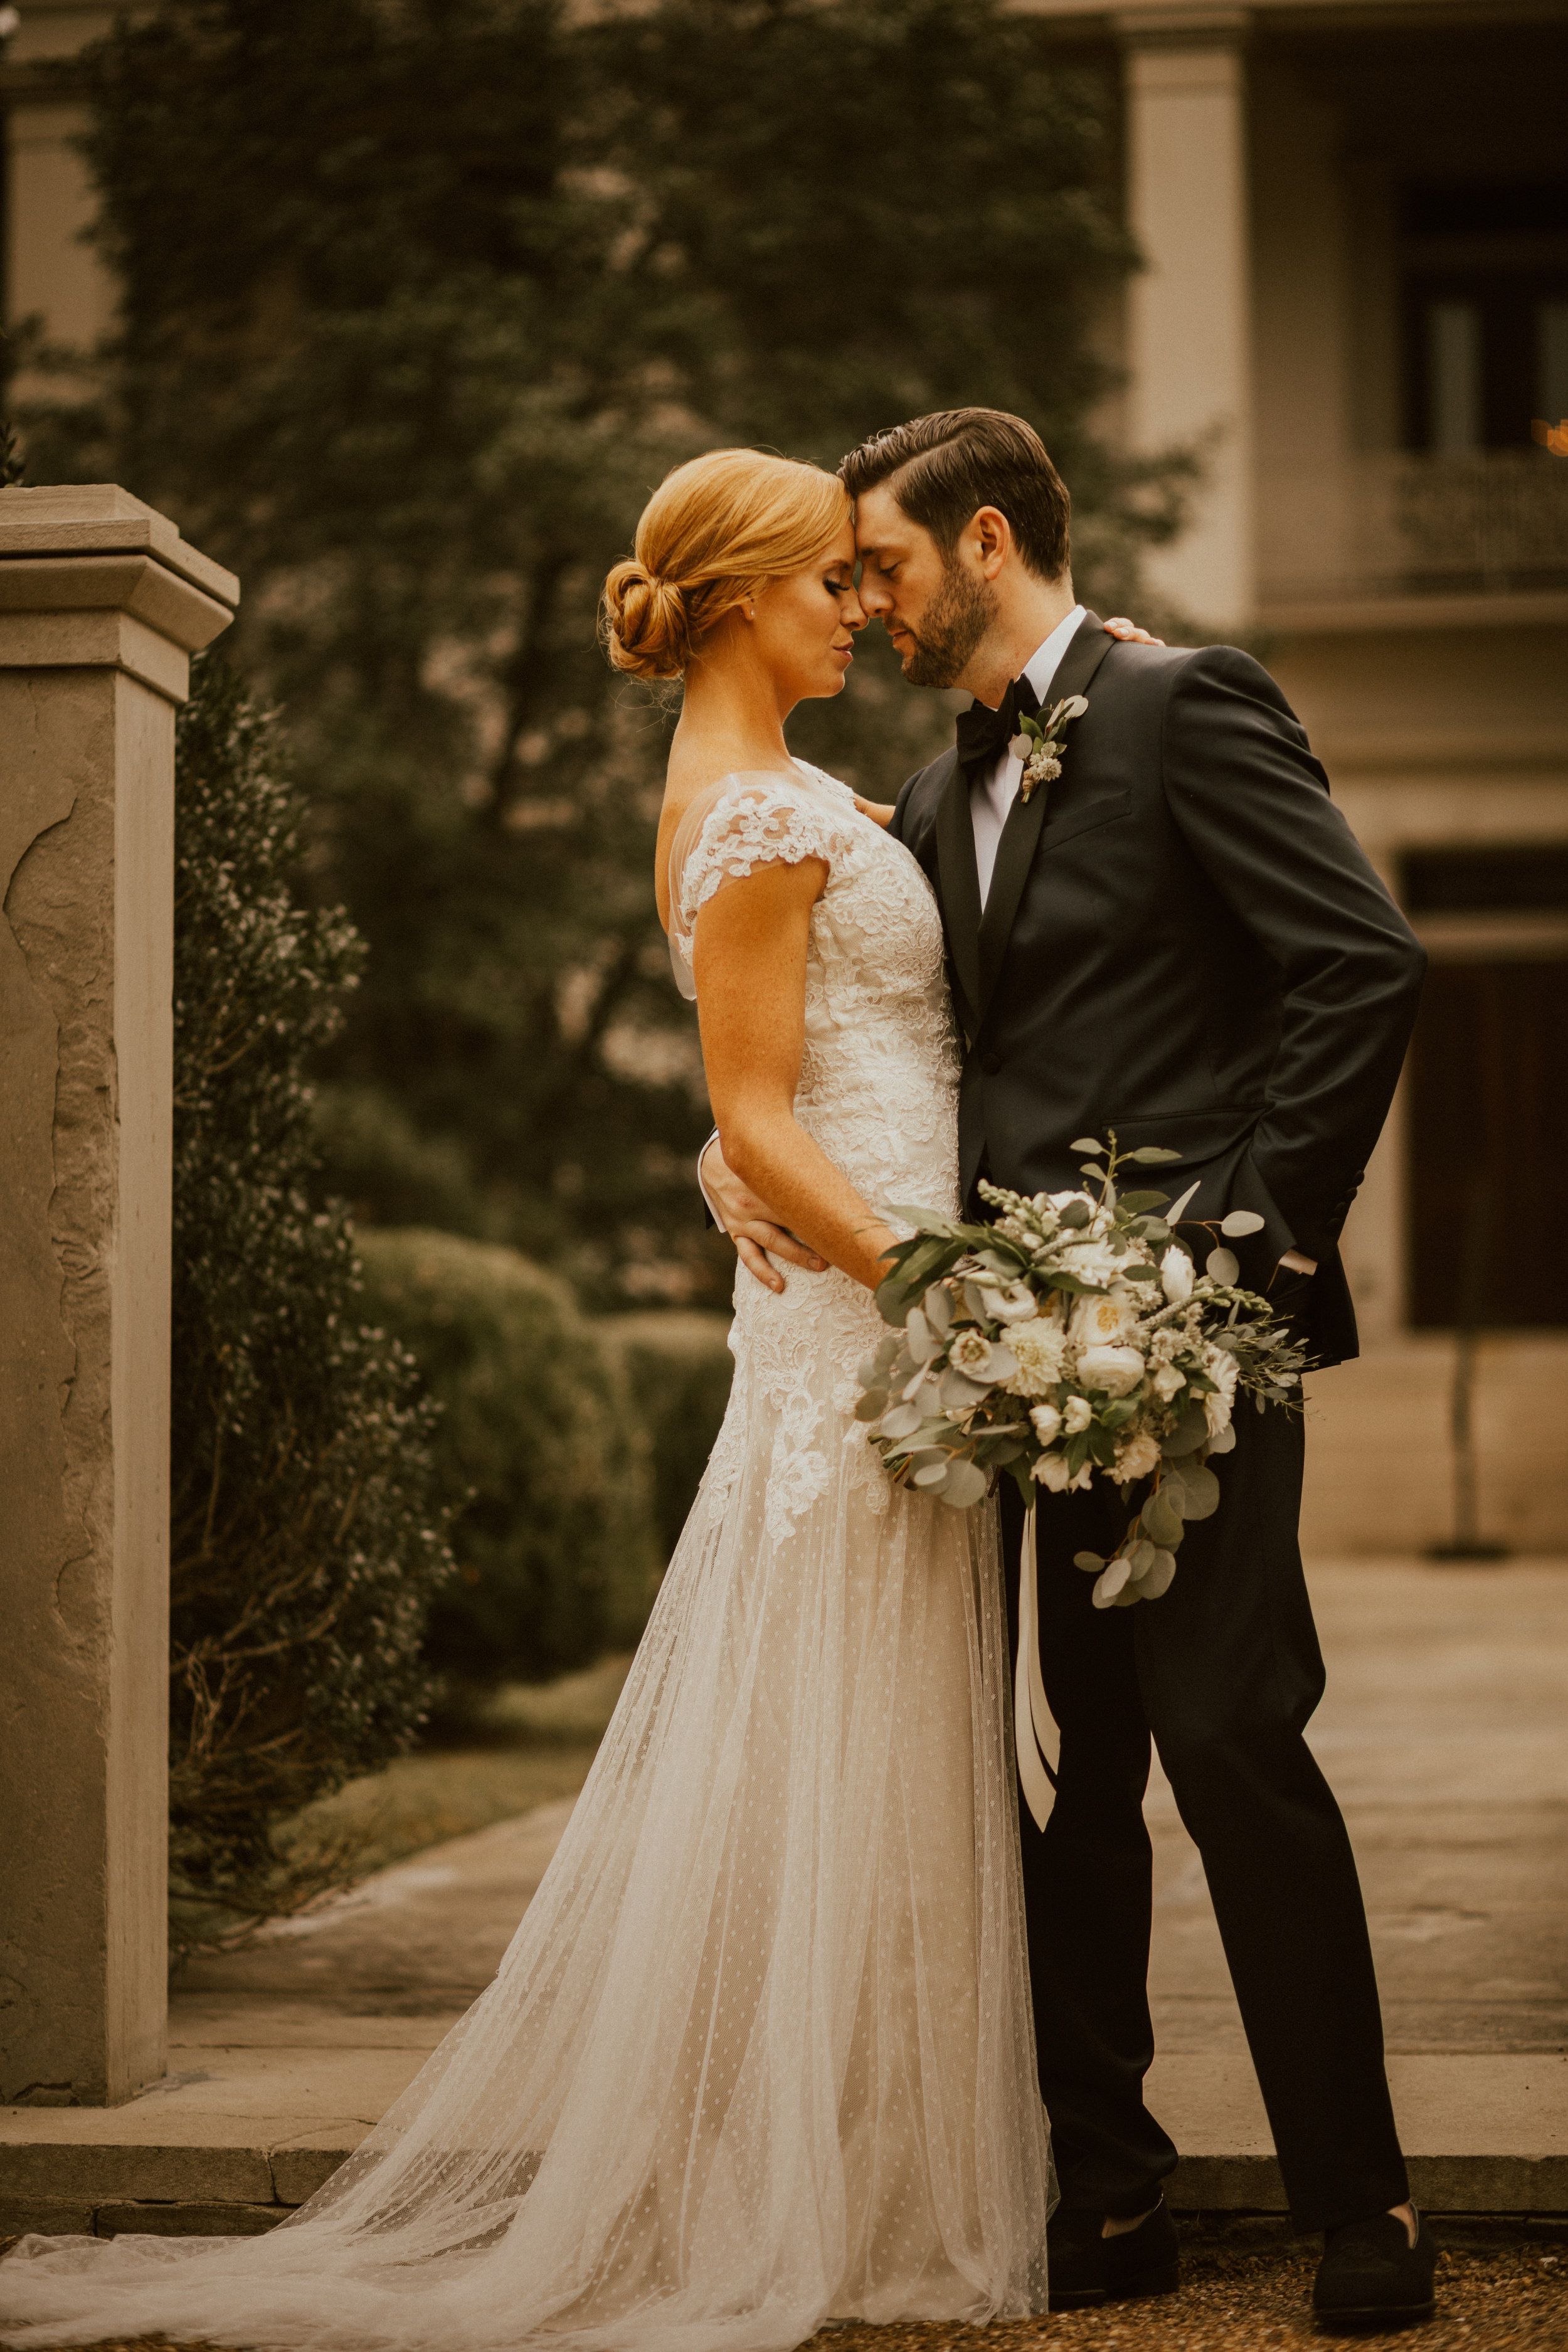 Nashville Wedding Photography by Saul Cervantes Photography-64.jpg